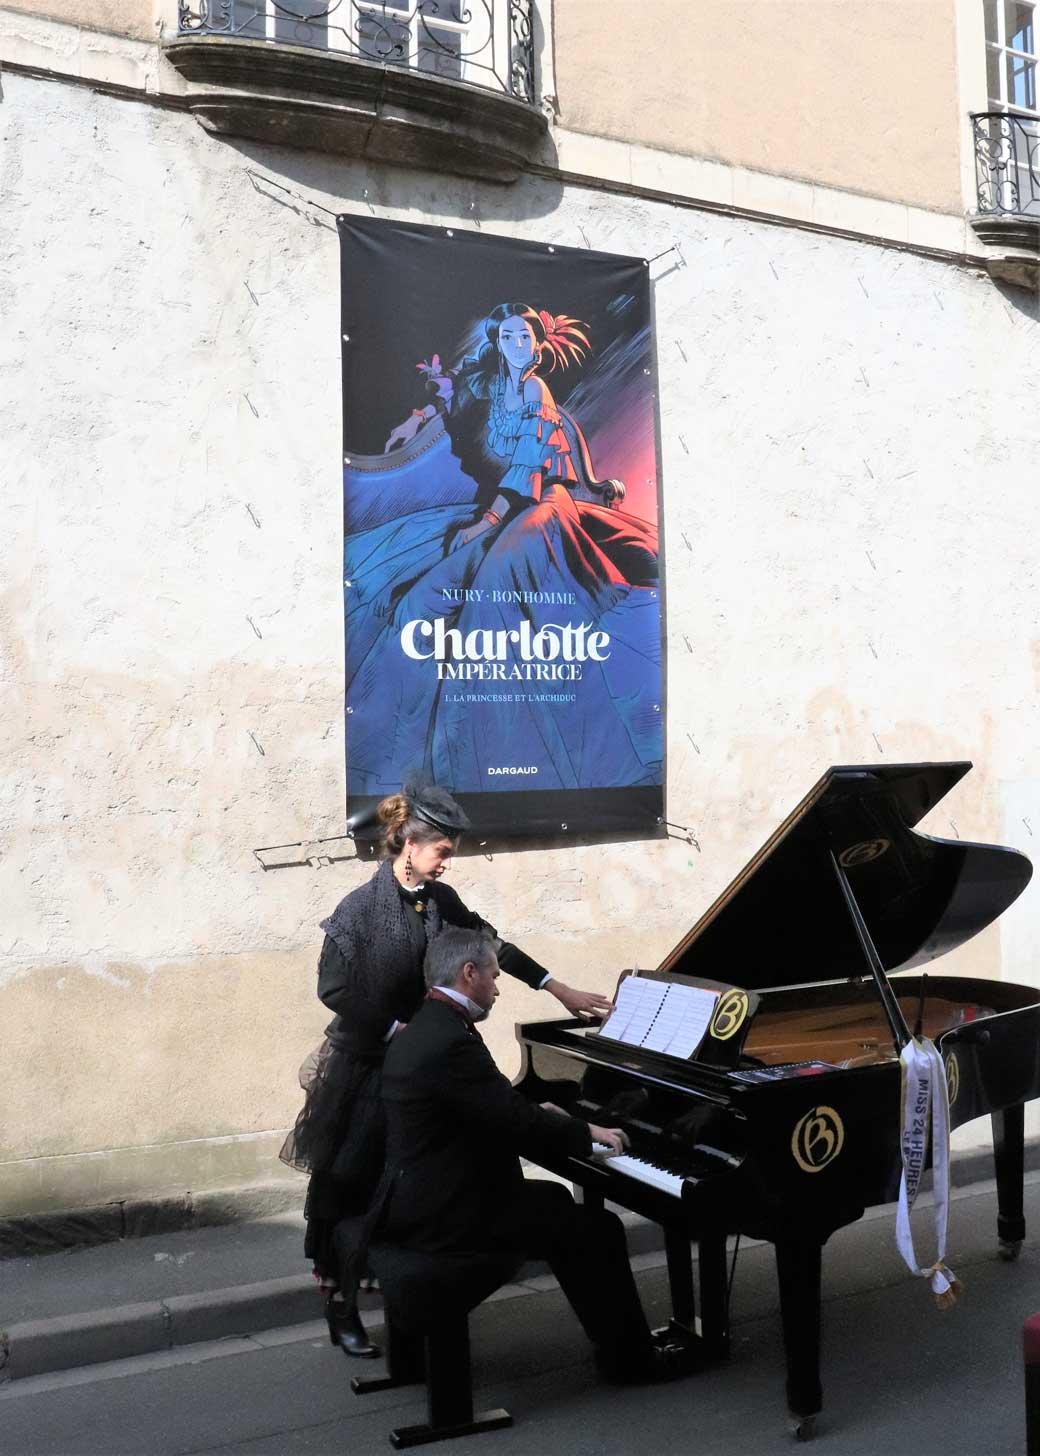 MATTHIEU BONHOMME CHARLOTTE IMPERATRICE SEPT 2018